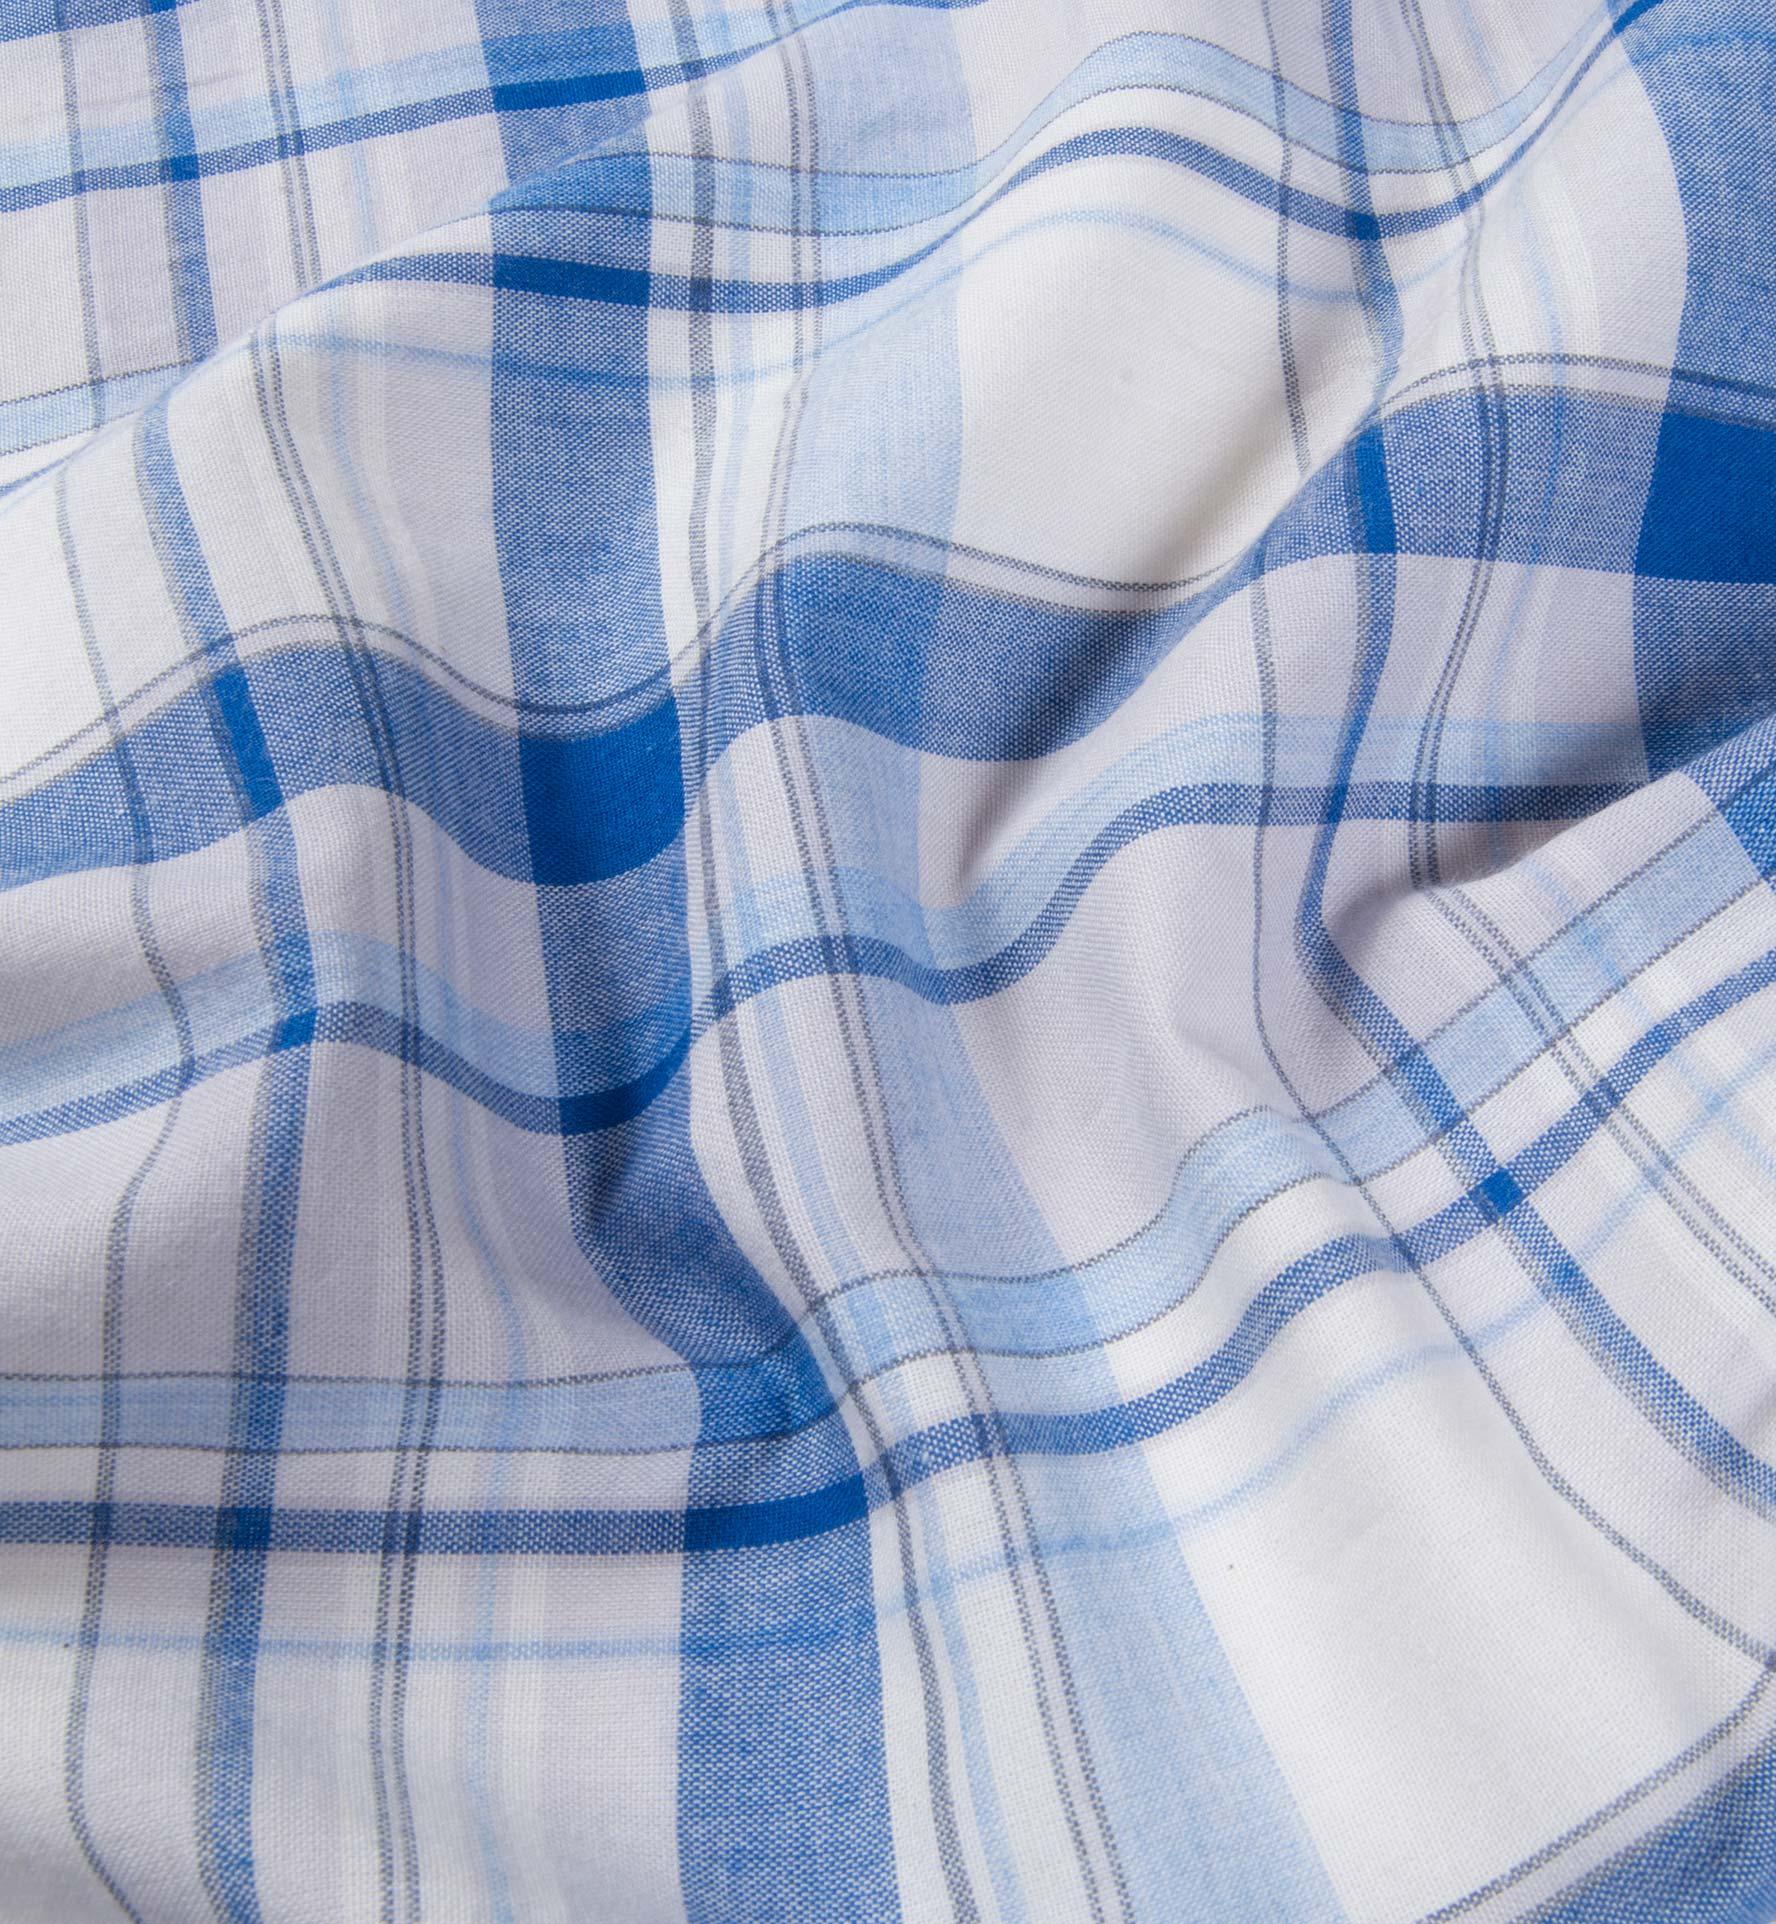 Blue And White Organic Madras Shirts By Proper Cloth